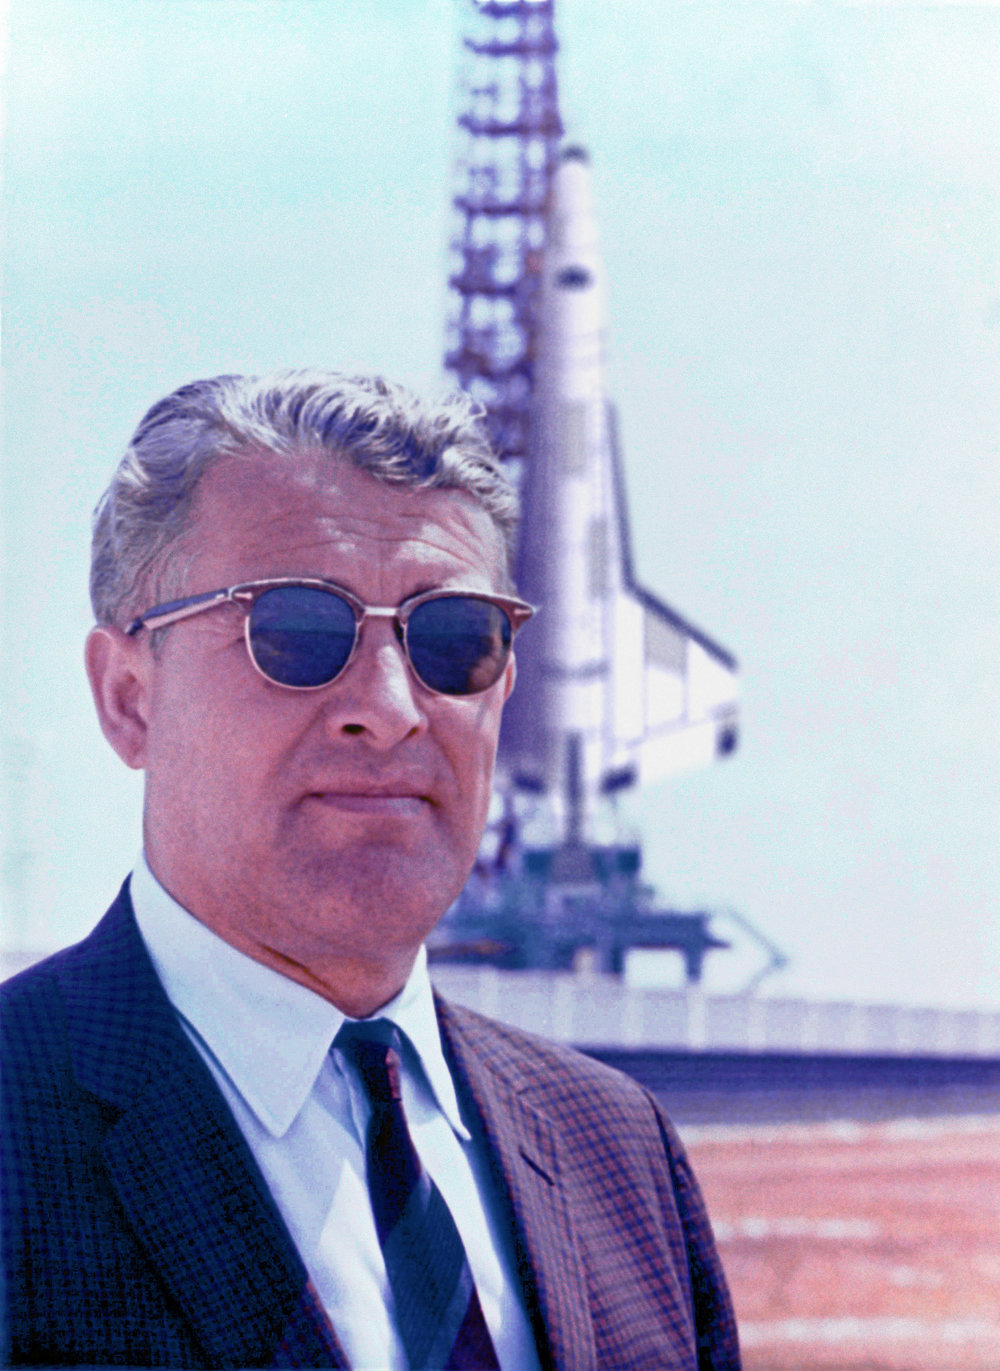 Argo-01 test launch site May 1964.jpg